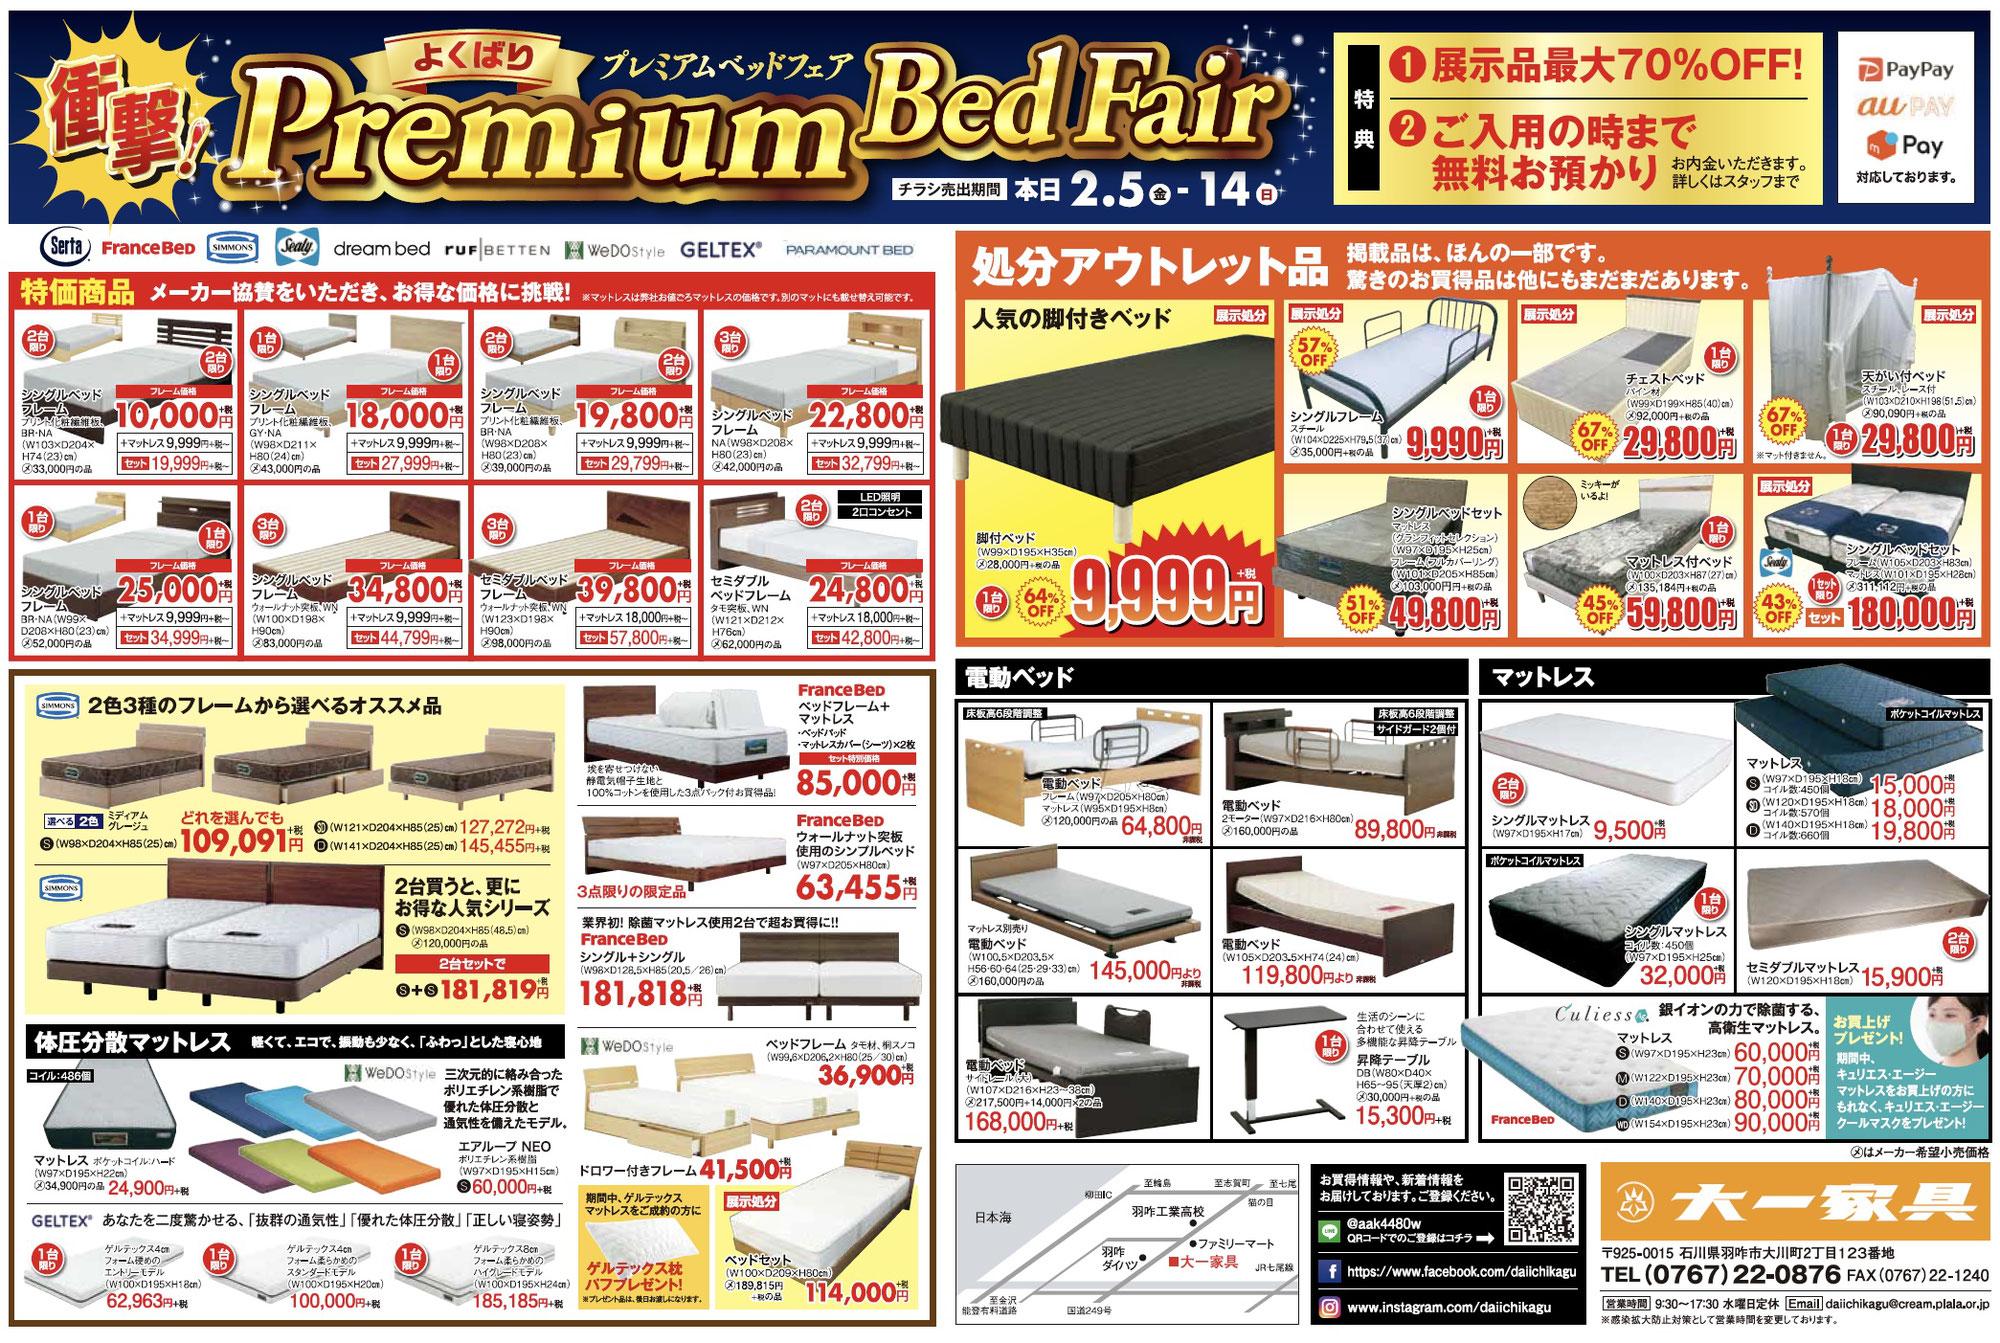 衝撃!Premium BED Fair開催‼